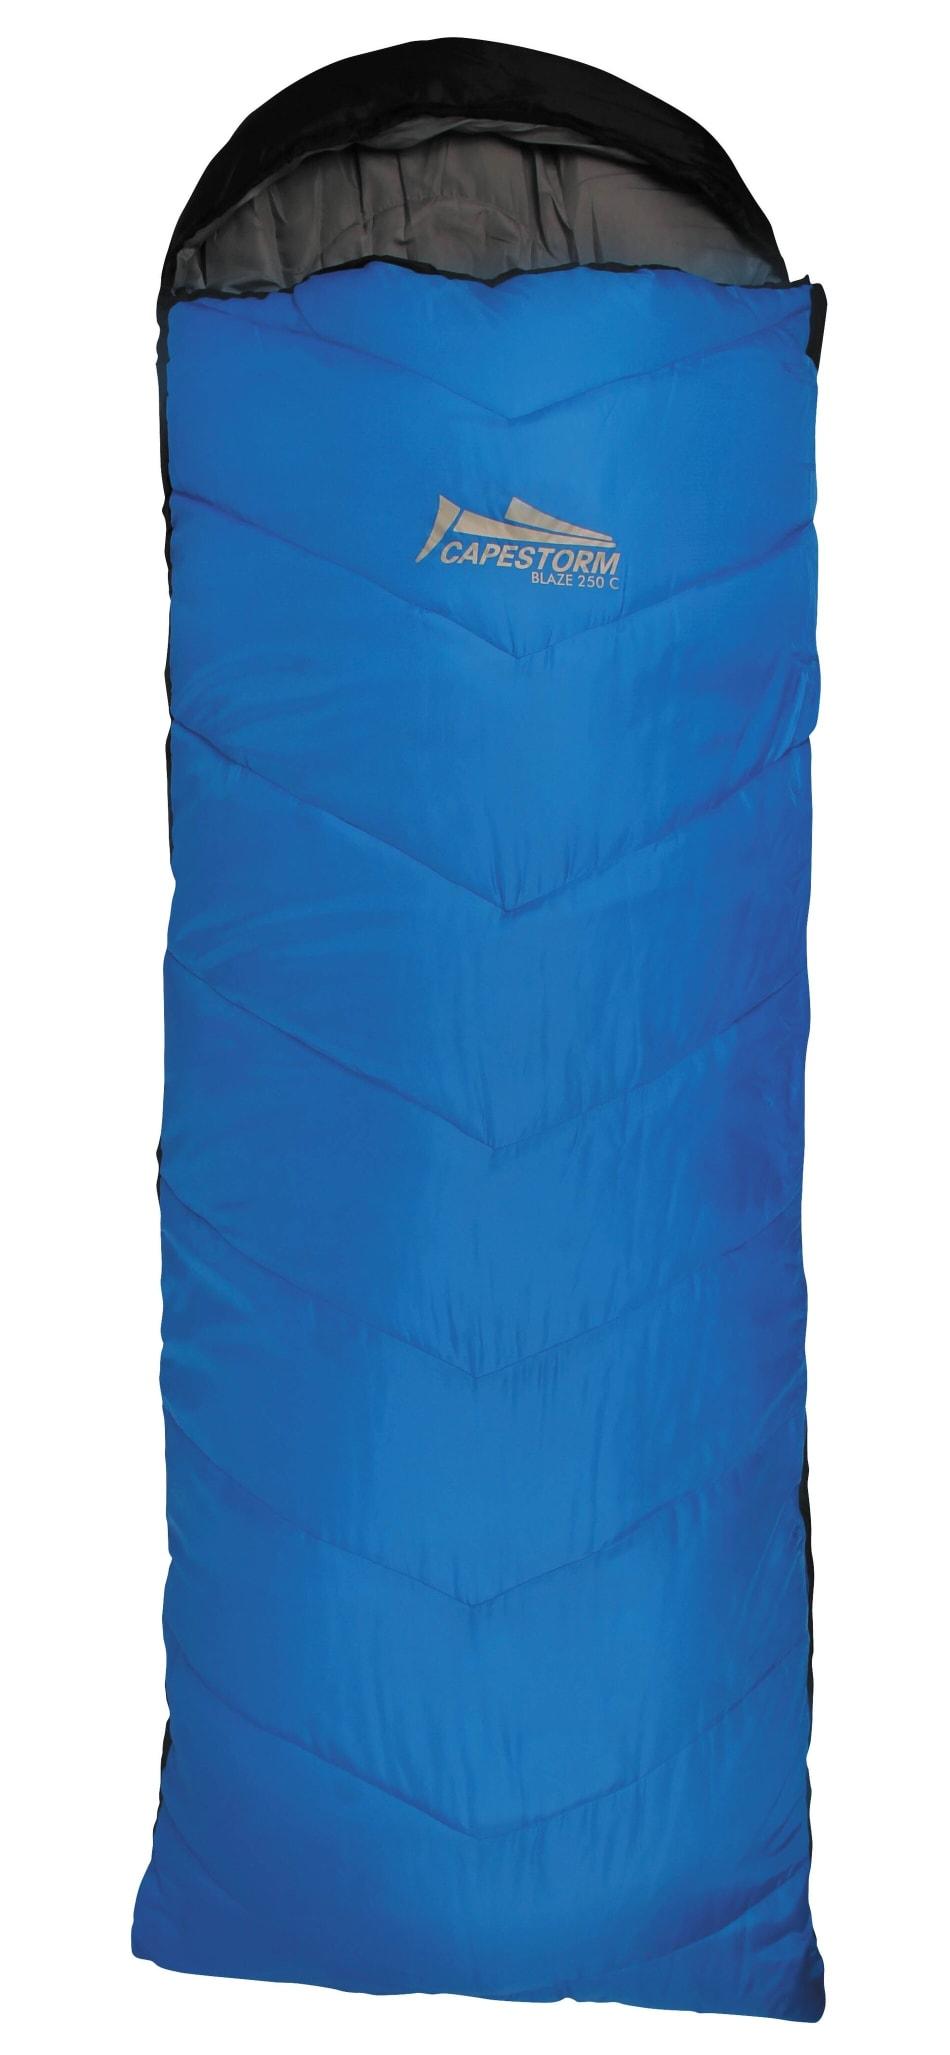 Capestorm Blaze 250 Cowl Sleeping Bag, product, variation 1